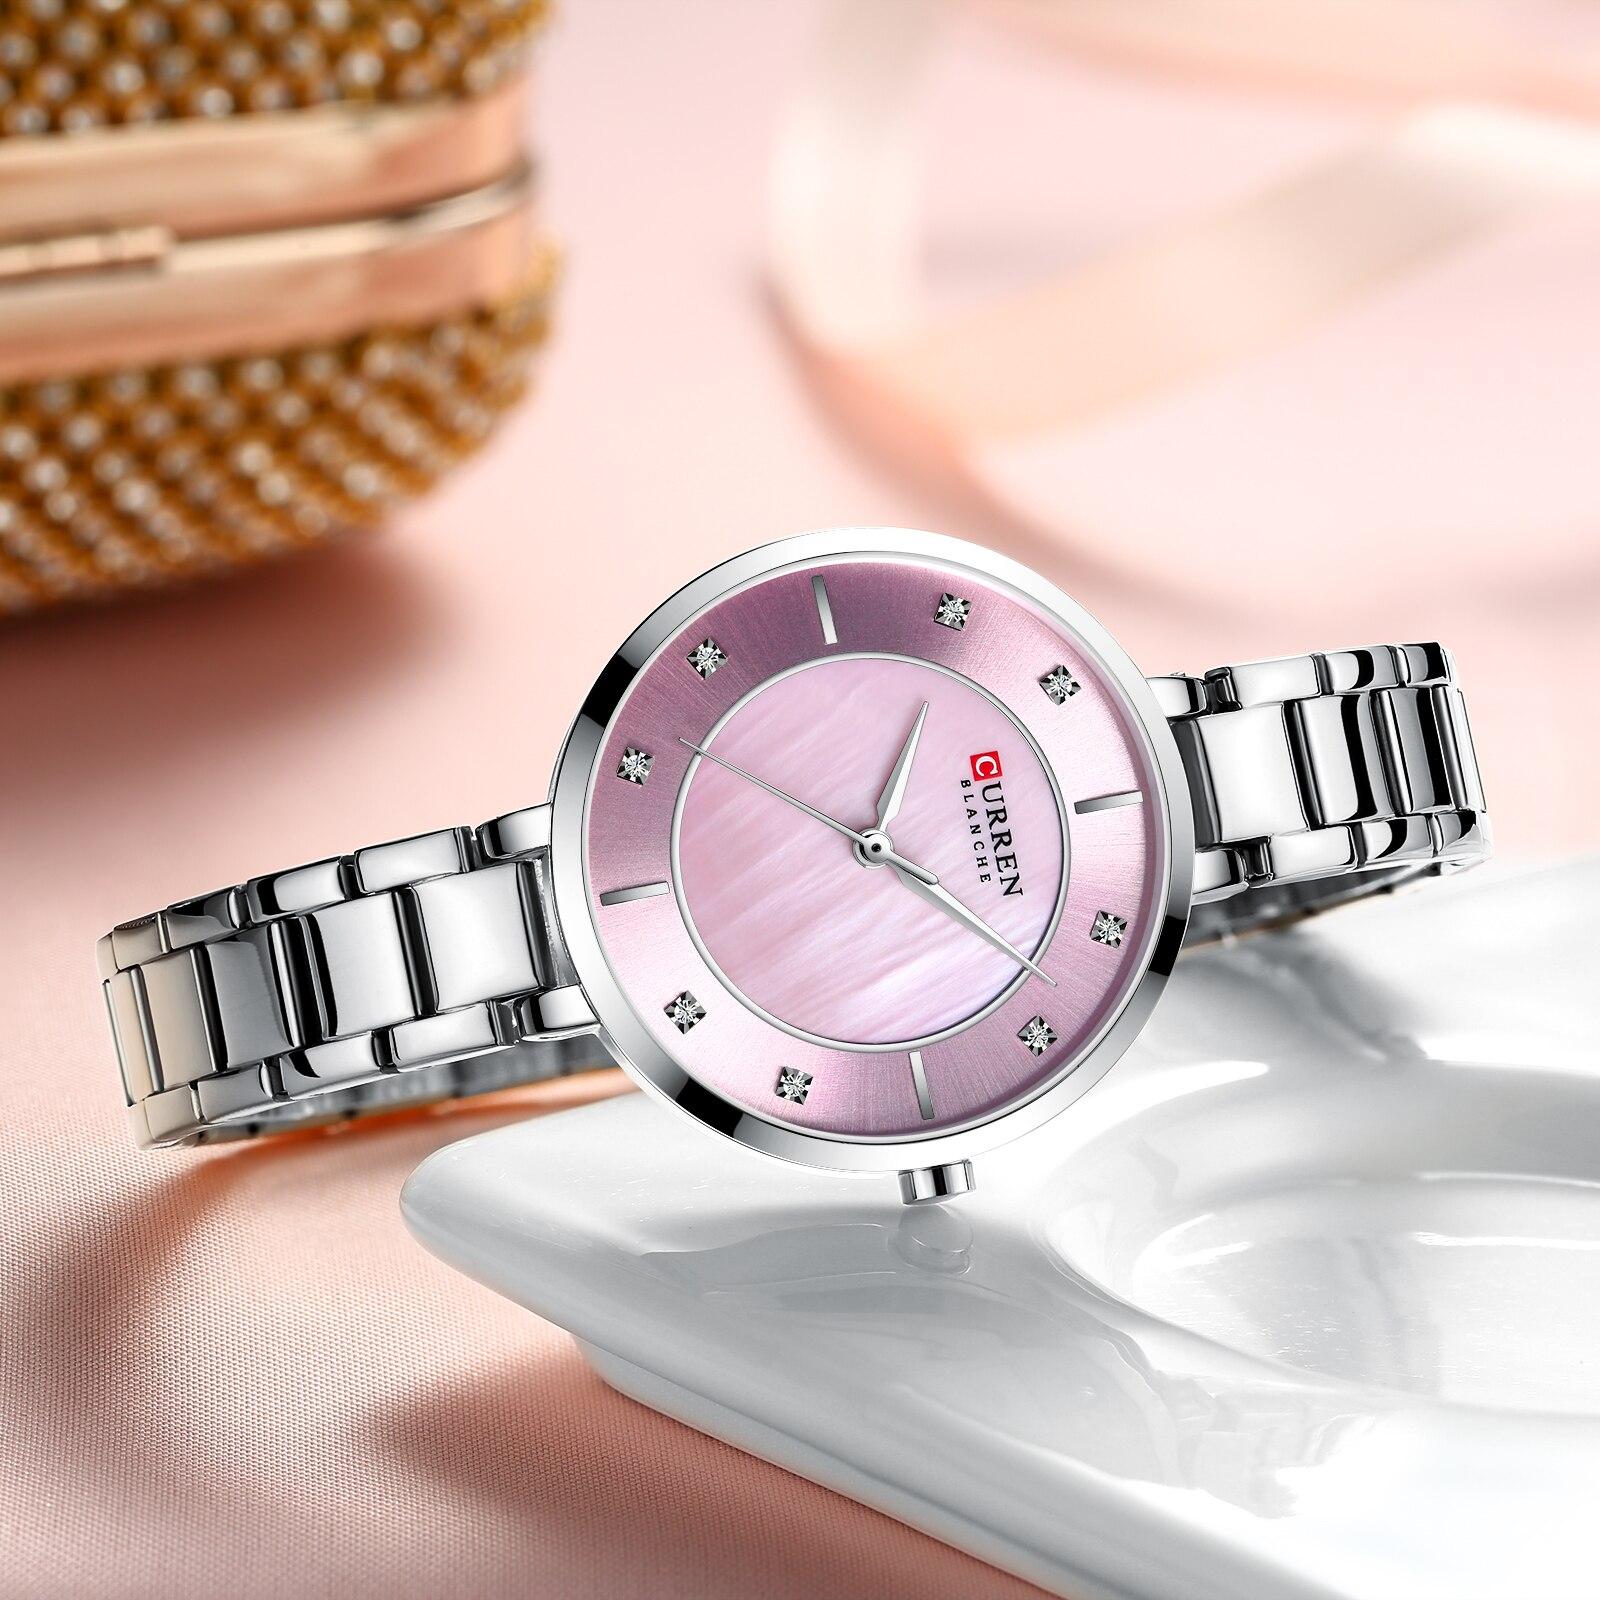 CURREN Luxury Lady Watch Pink Silver Slim Dial Stainless Steel Strap Rhinestone Diamond Quartz Female Girls Brand Watches Clock enlarge